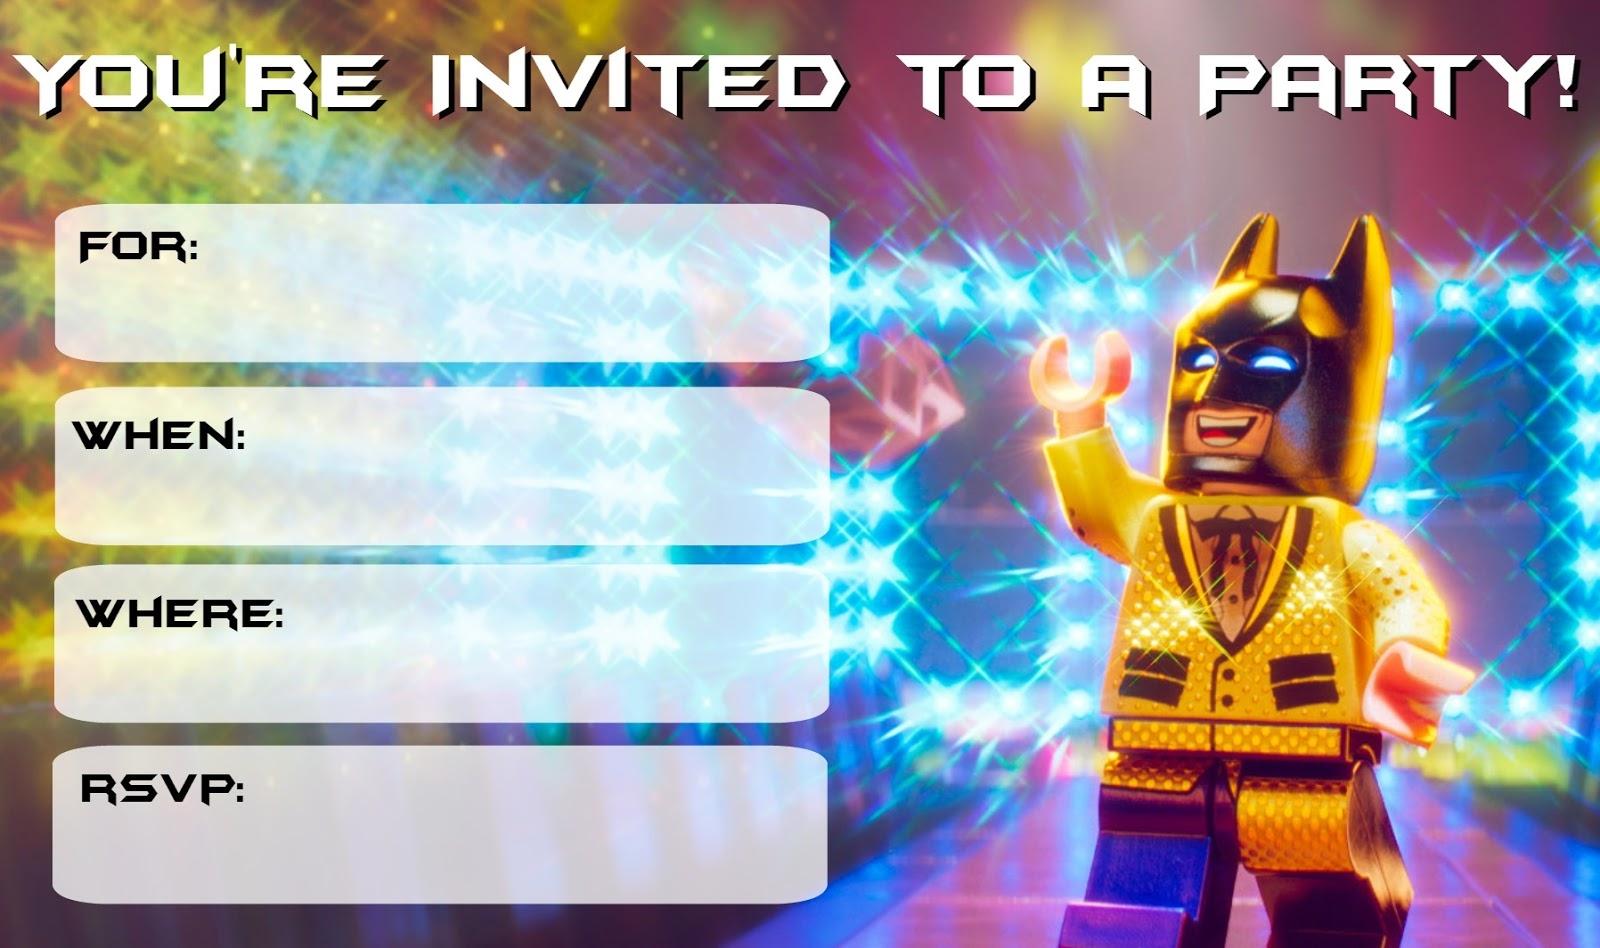 Musings Of An Average Mom Lego Batman Movie Party Invitations With - Lego Batman Party Invitations Free Printable